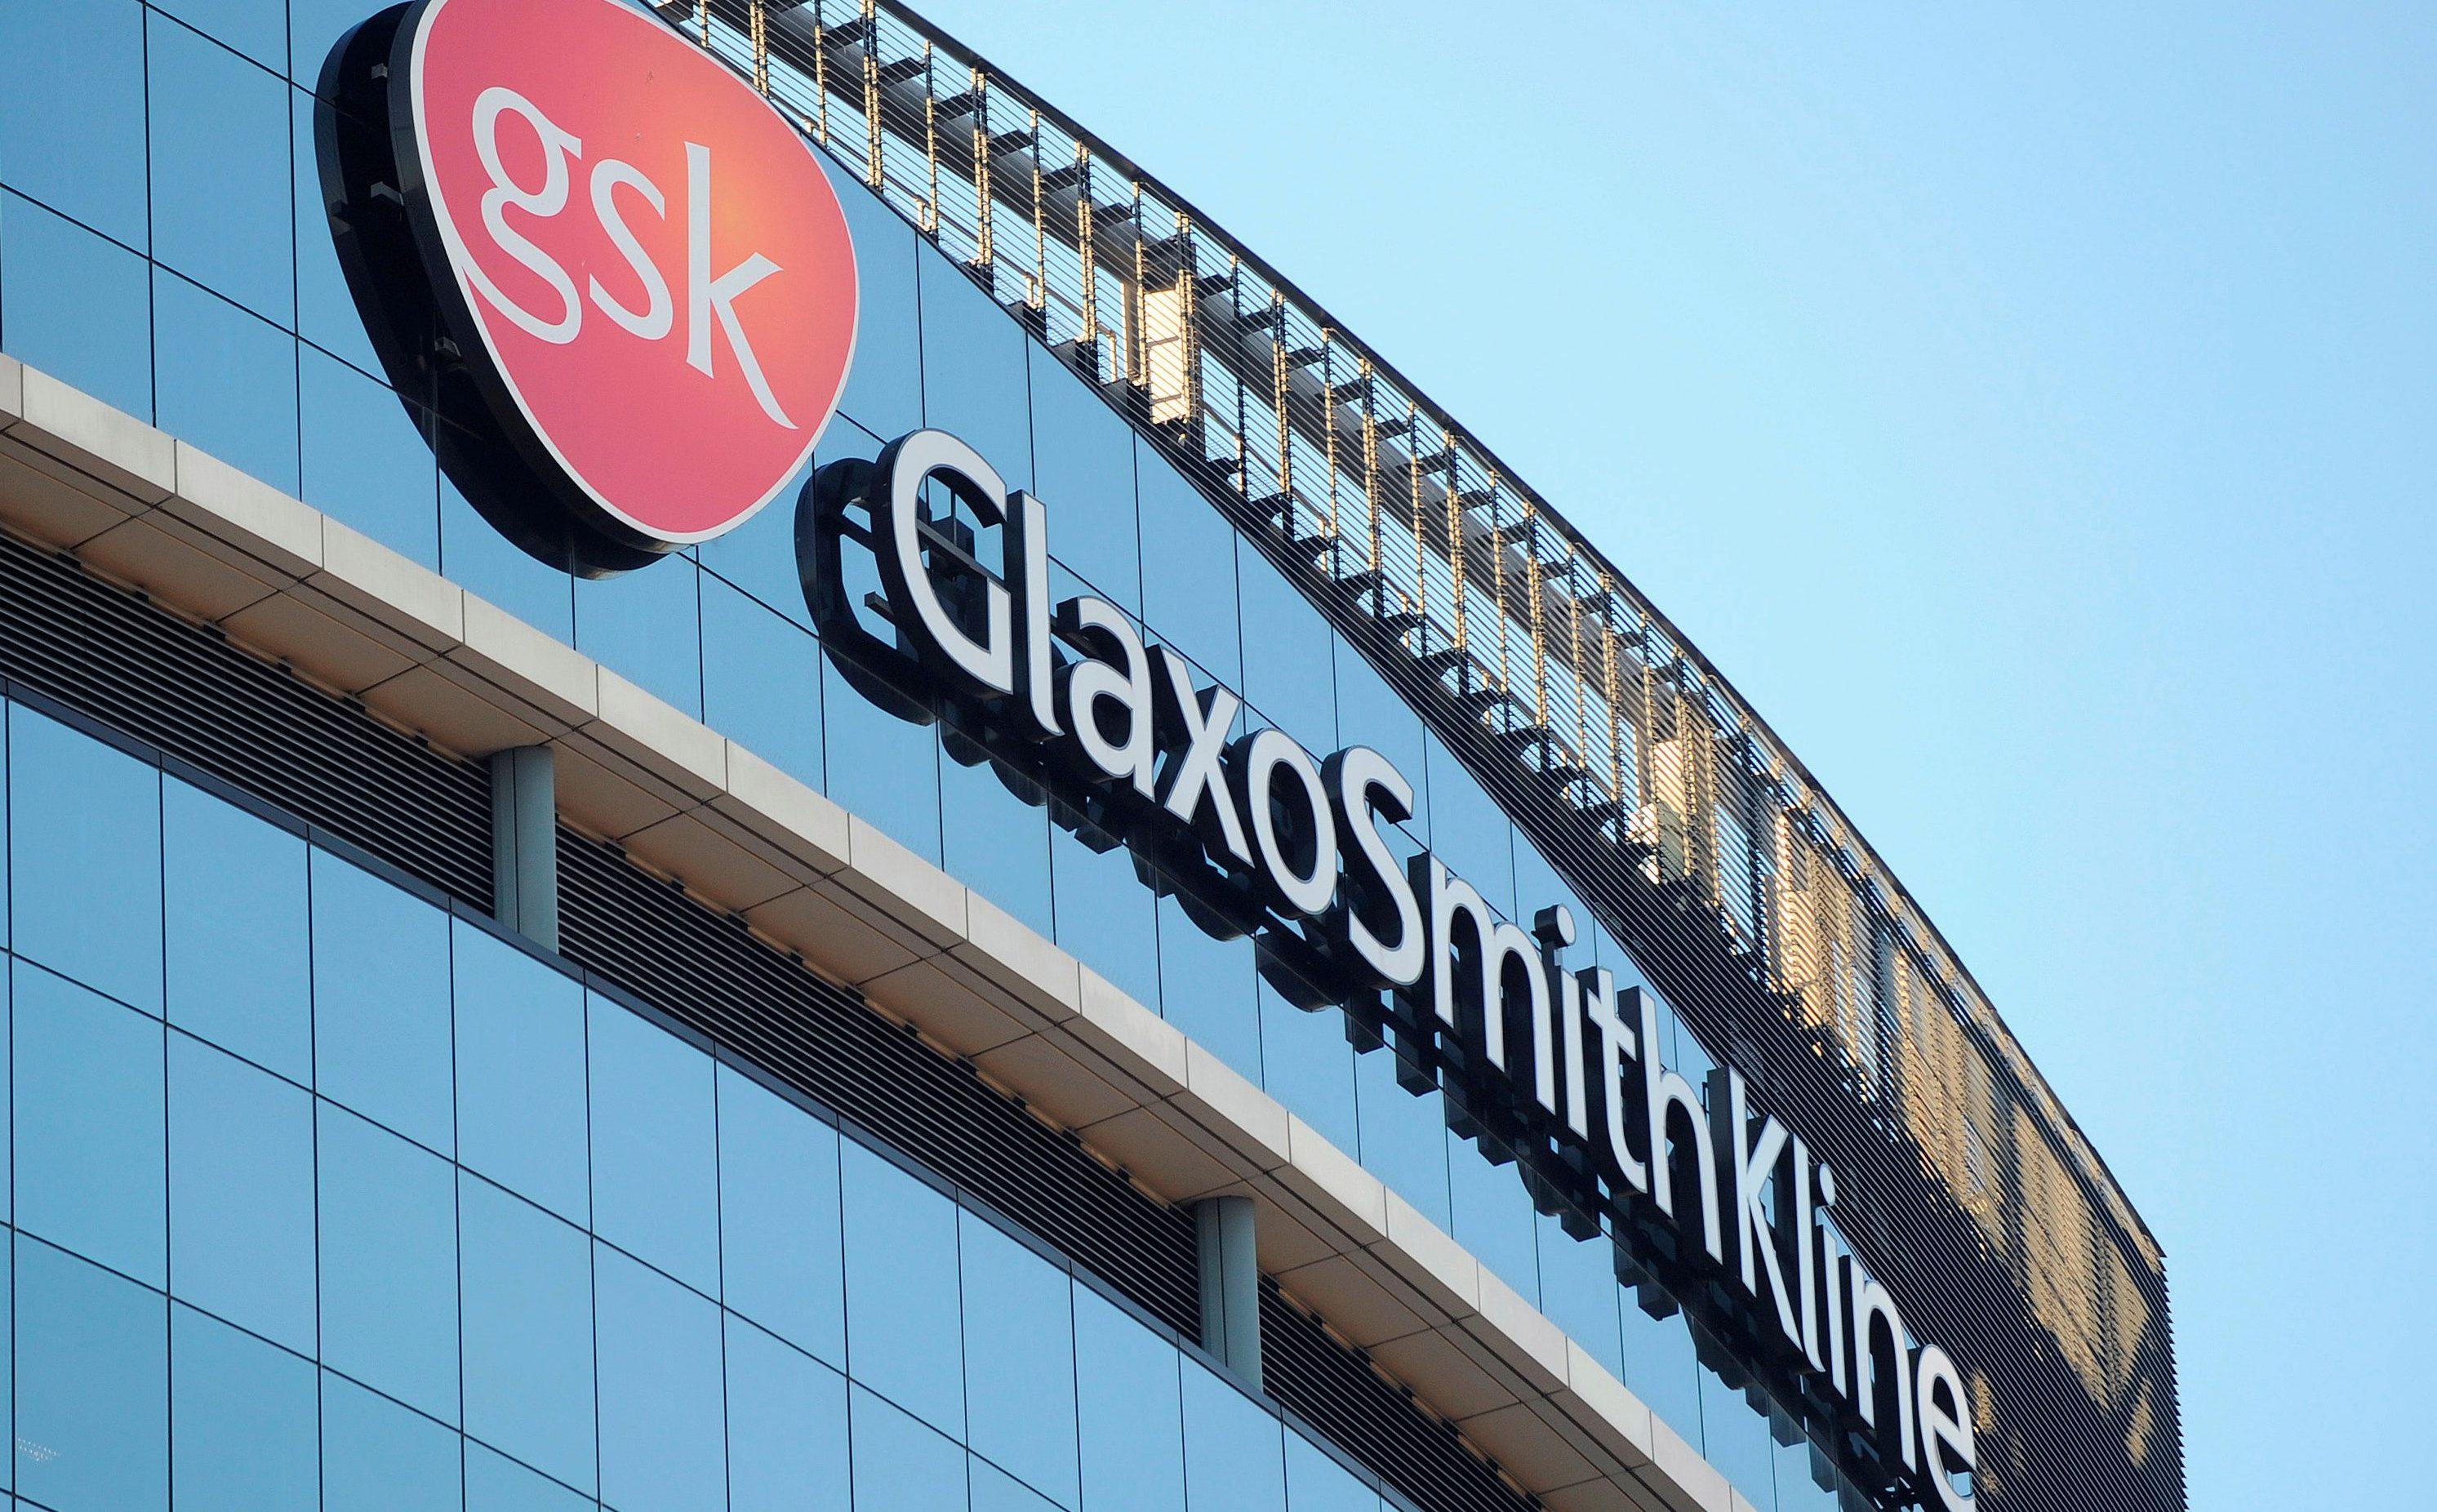 A GlaxoSmithKline building in London